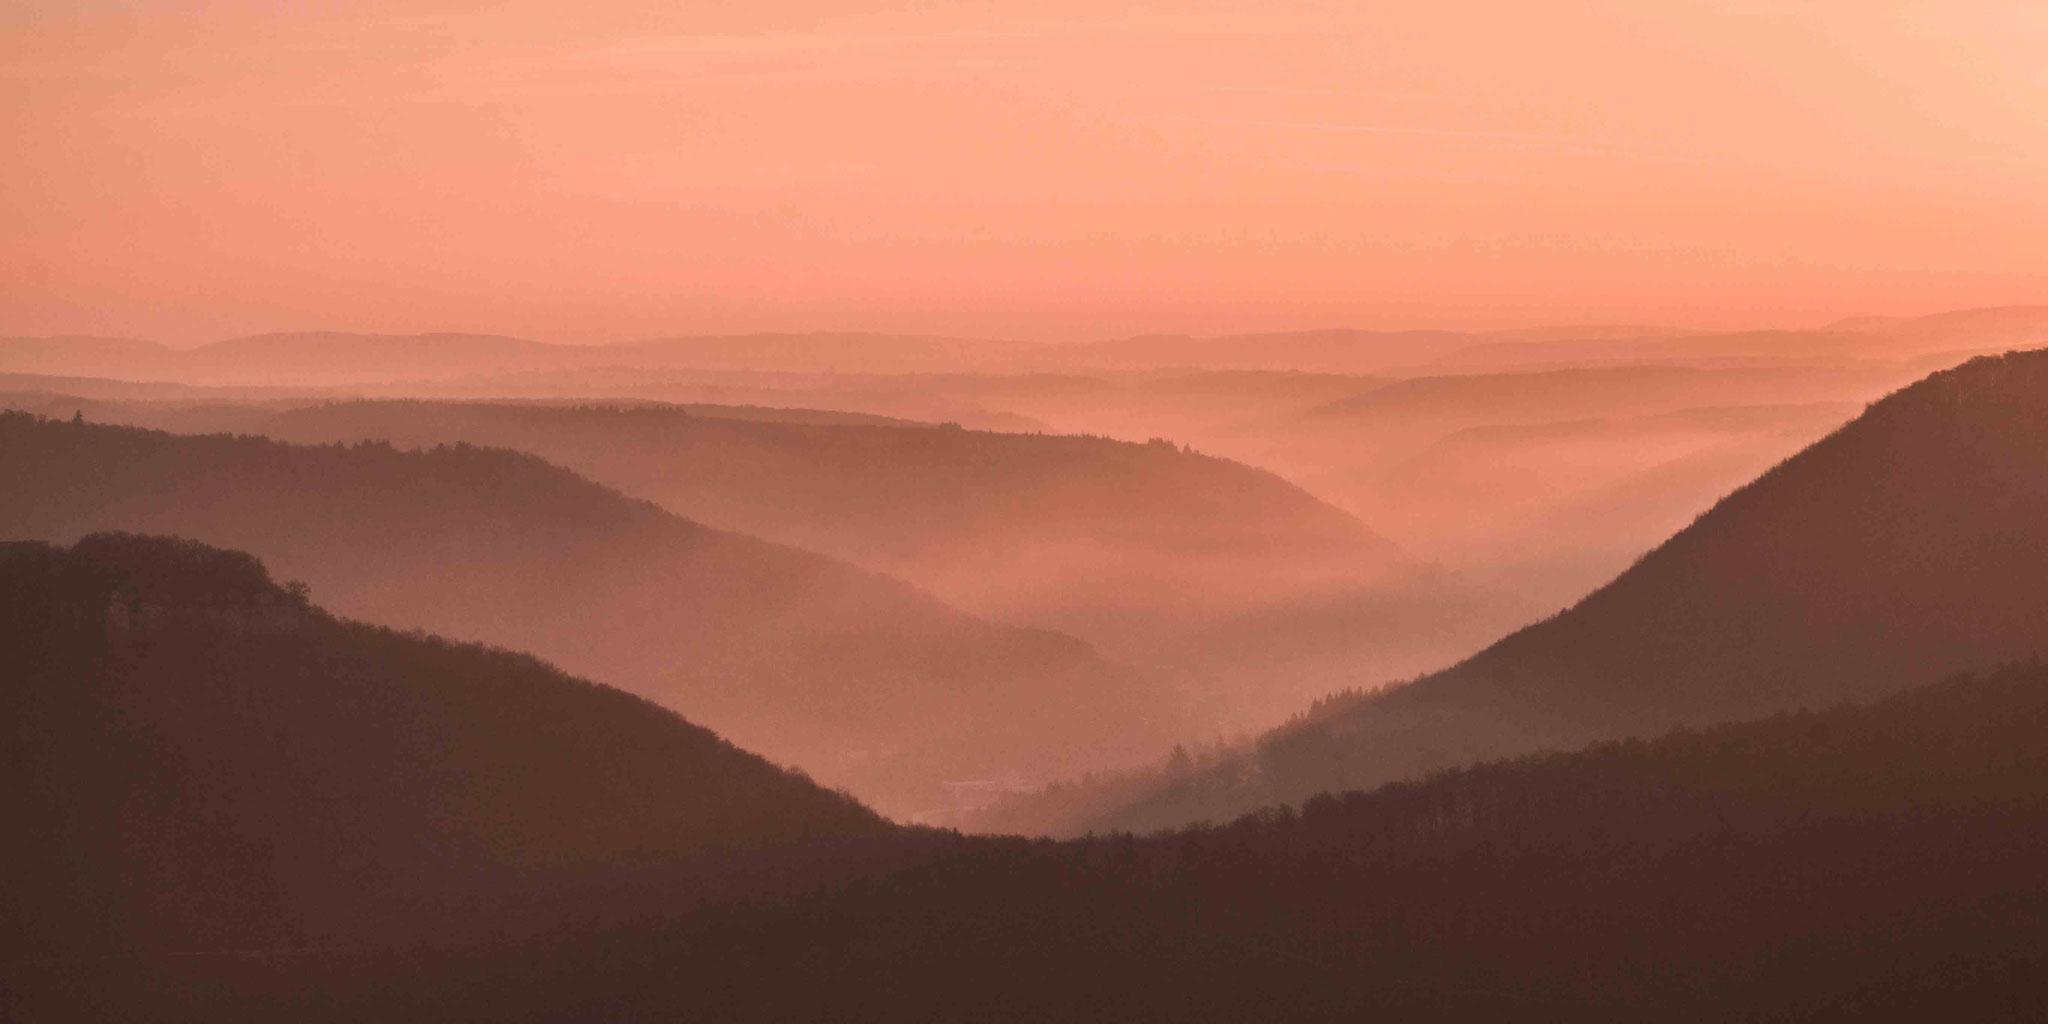 Orange Rotes Tal; Ermstal bei Bad Urach